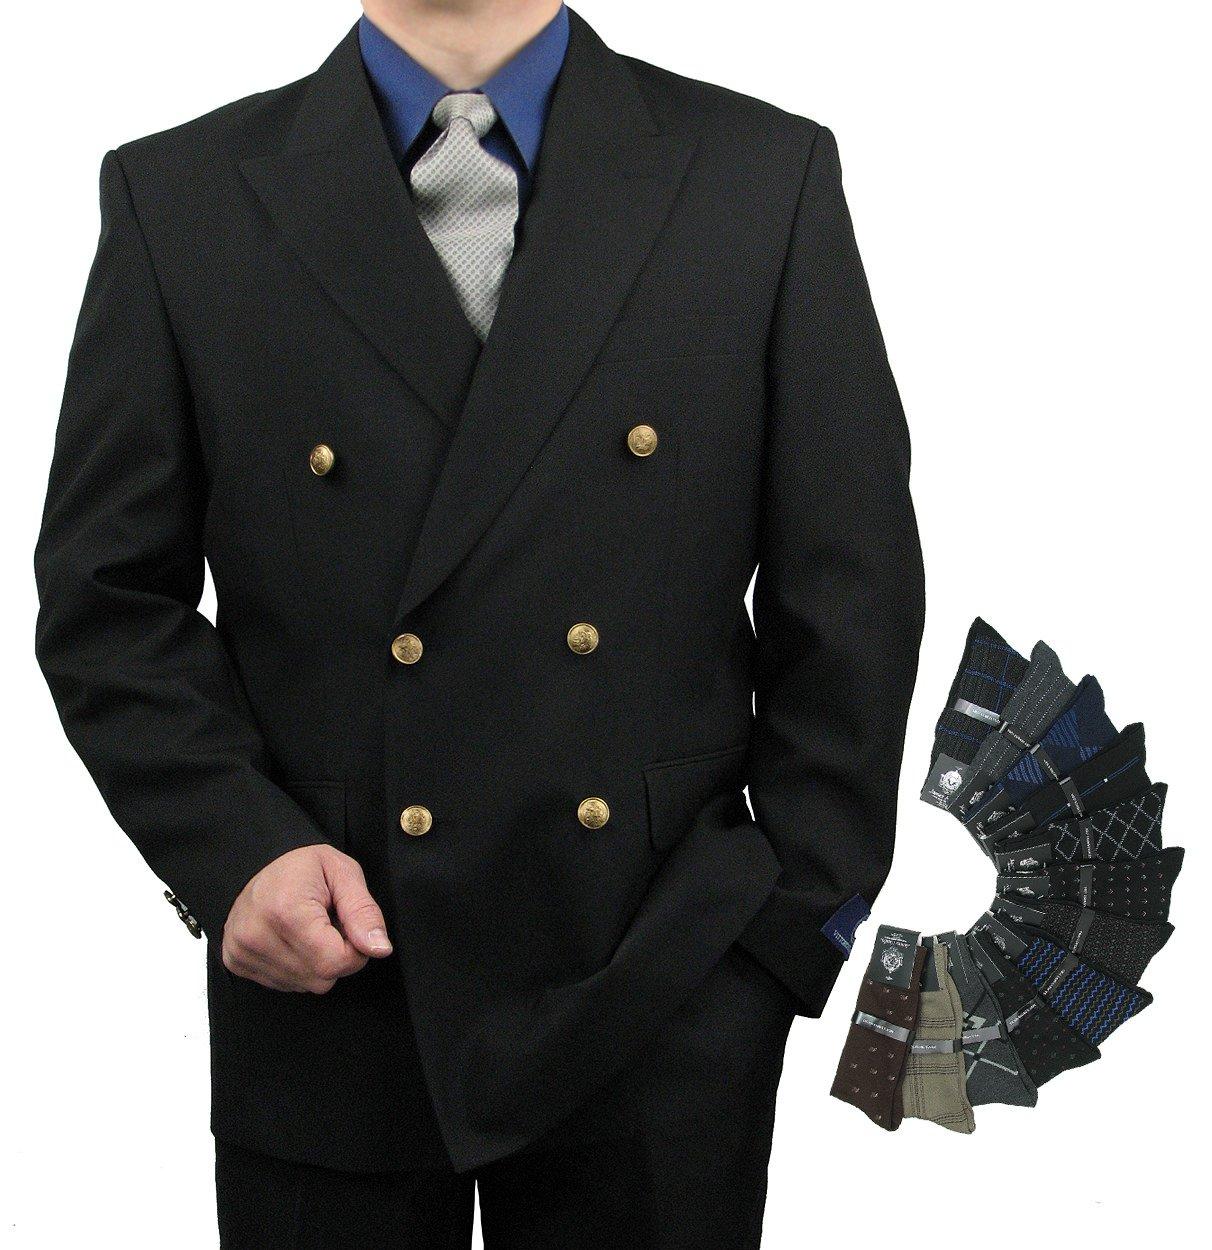 Men's Classic Fit Double-Breasted Blazer Jacket Sports Coat w/One Pair Of Dress Socks - Black 44L